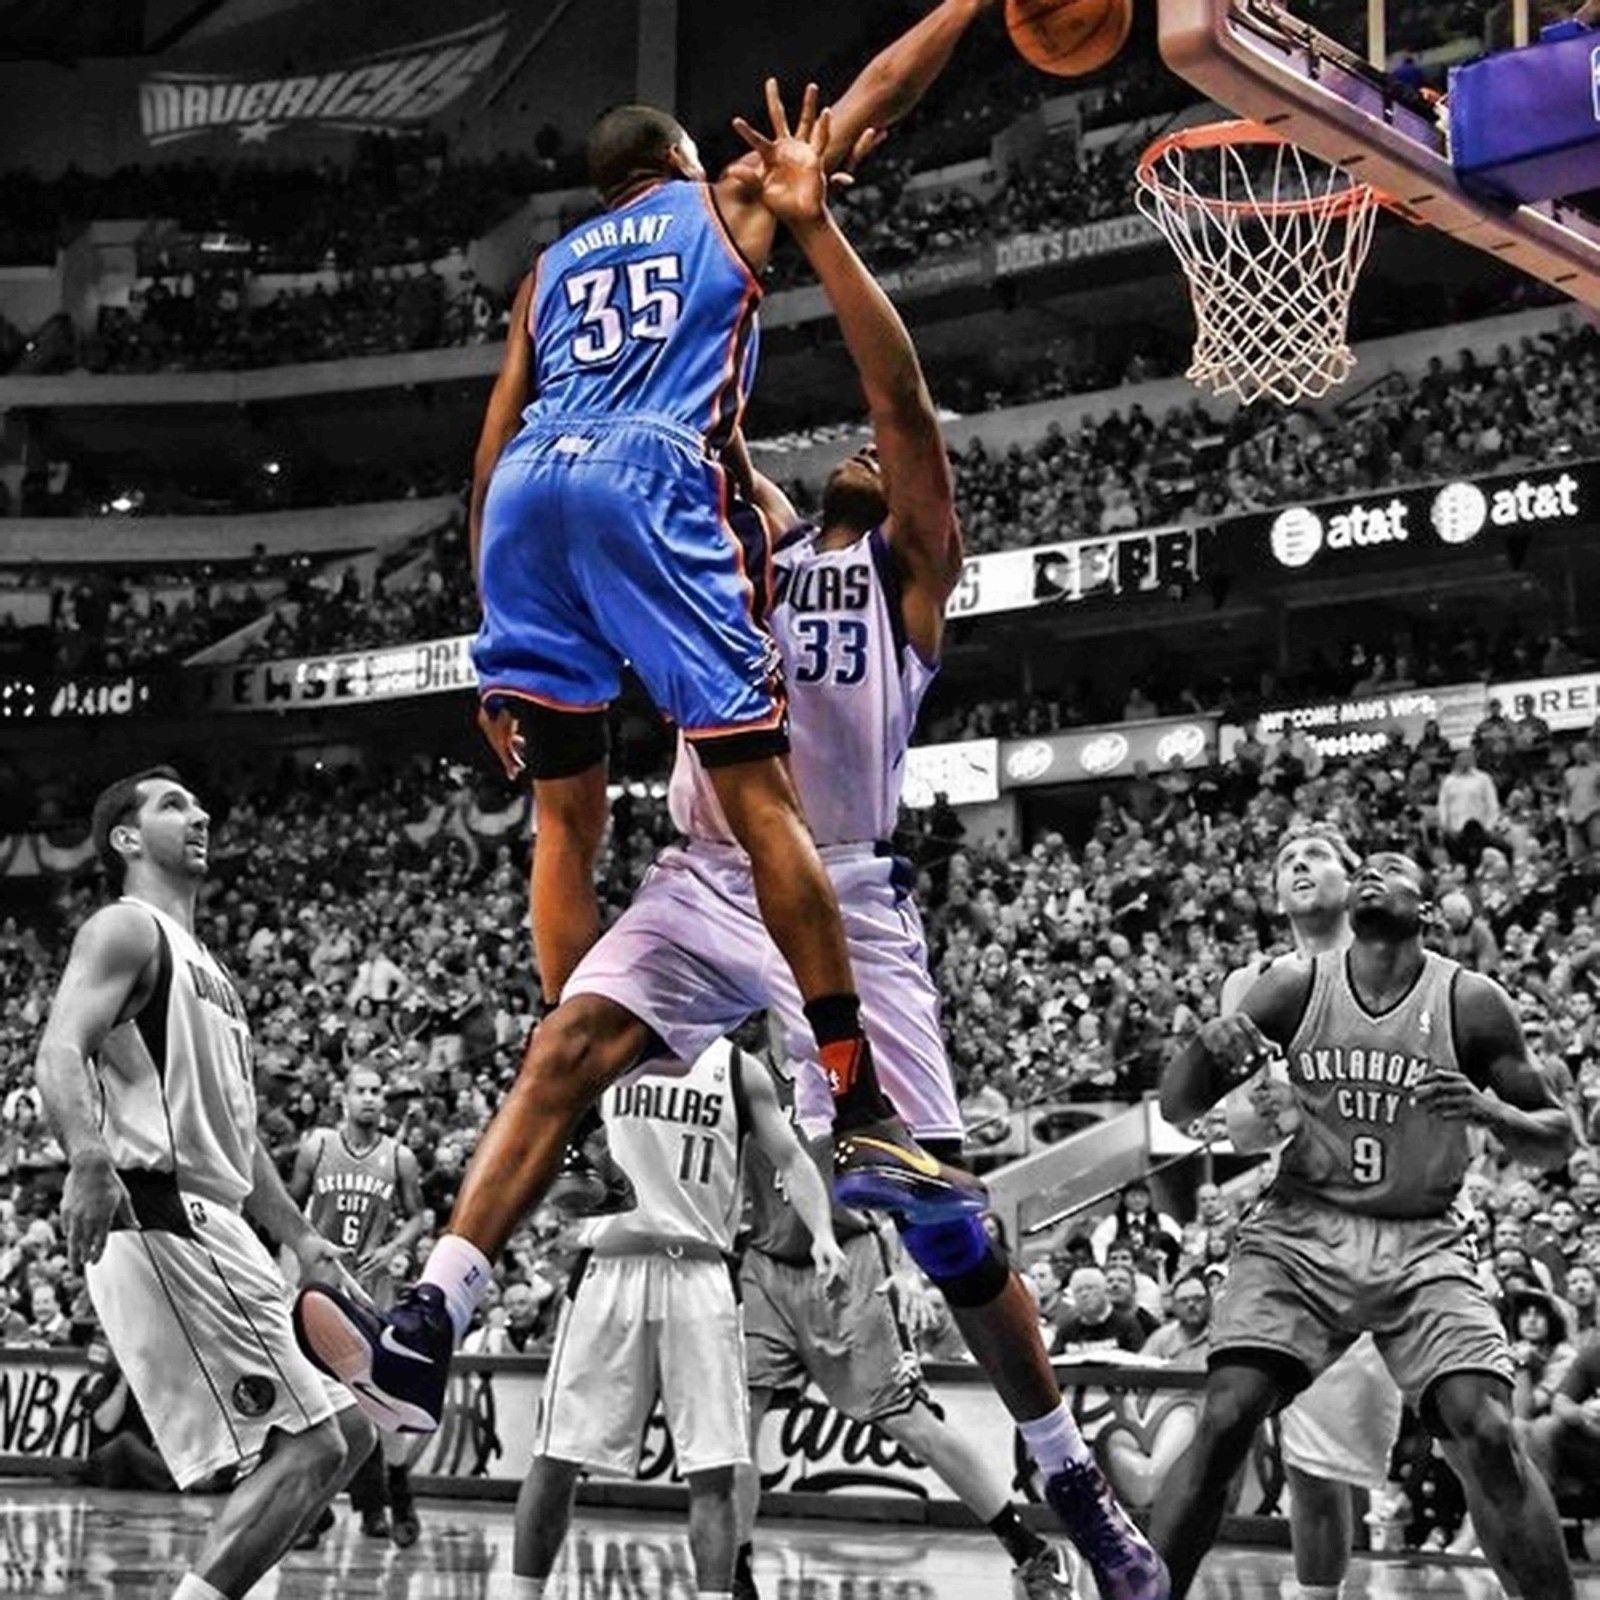 Oklahoma City Thunder poster wall decoration photo print 24x24 inches